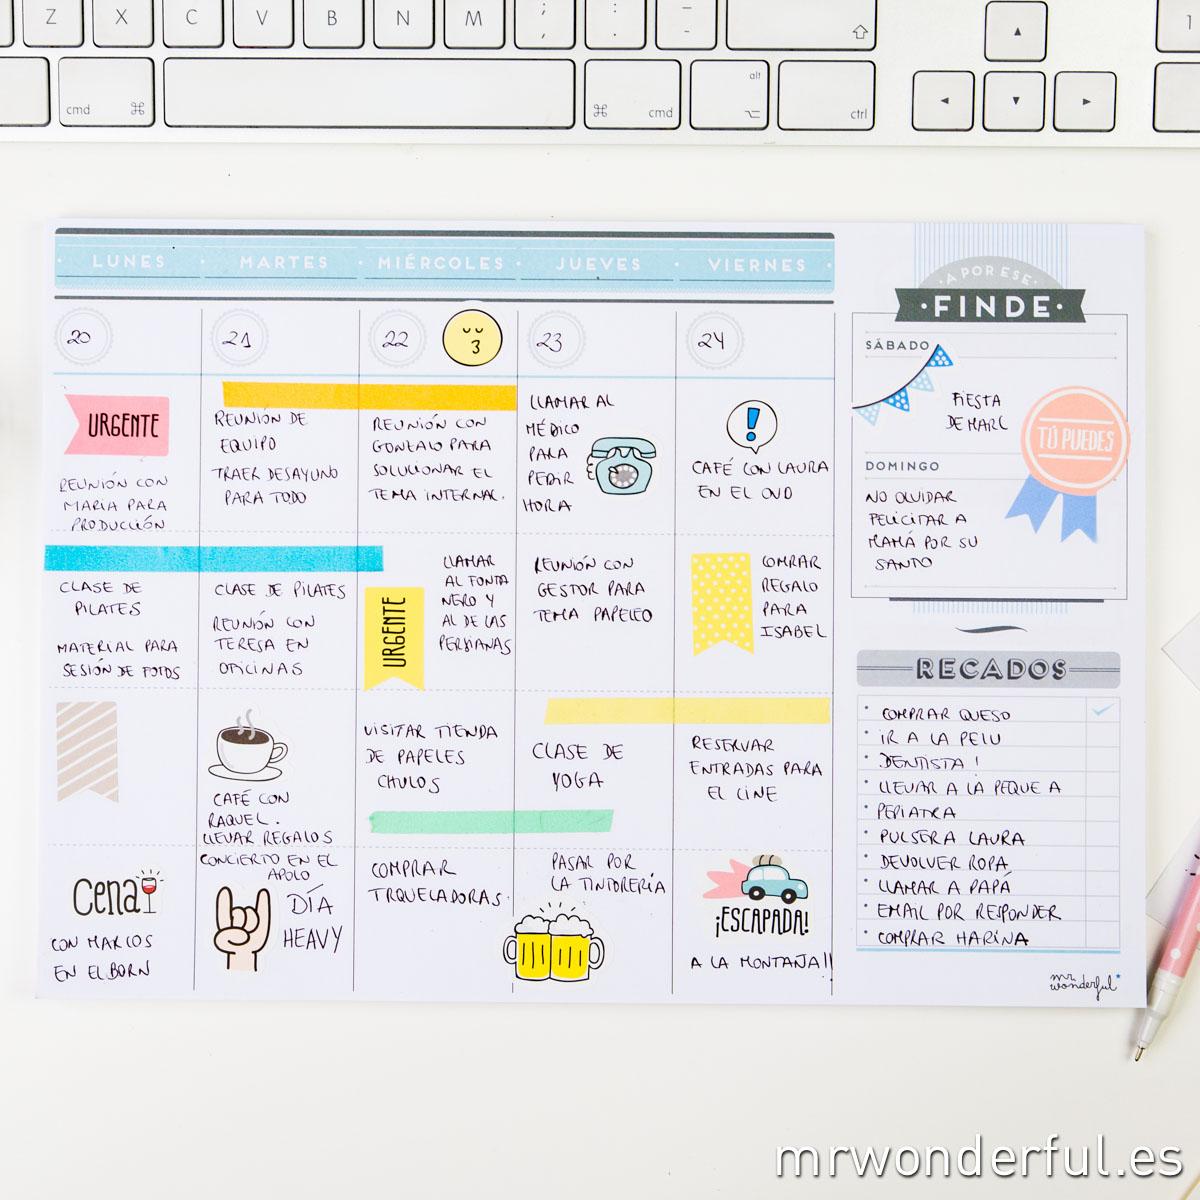 rwonderful_Organizador_oficina-29